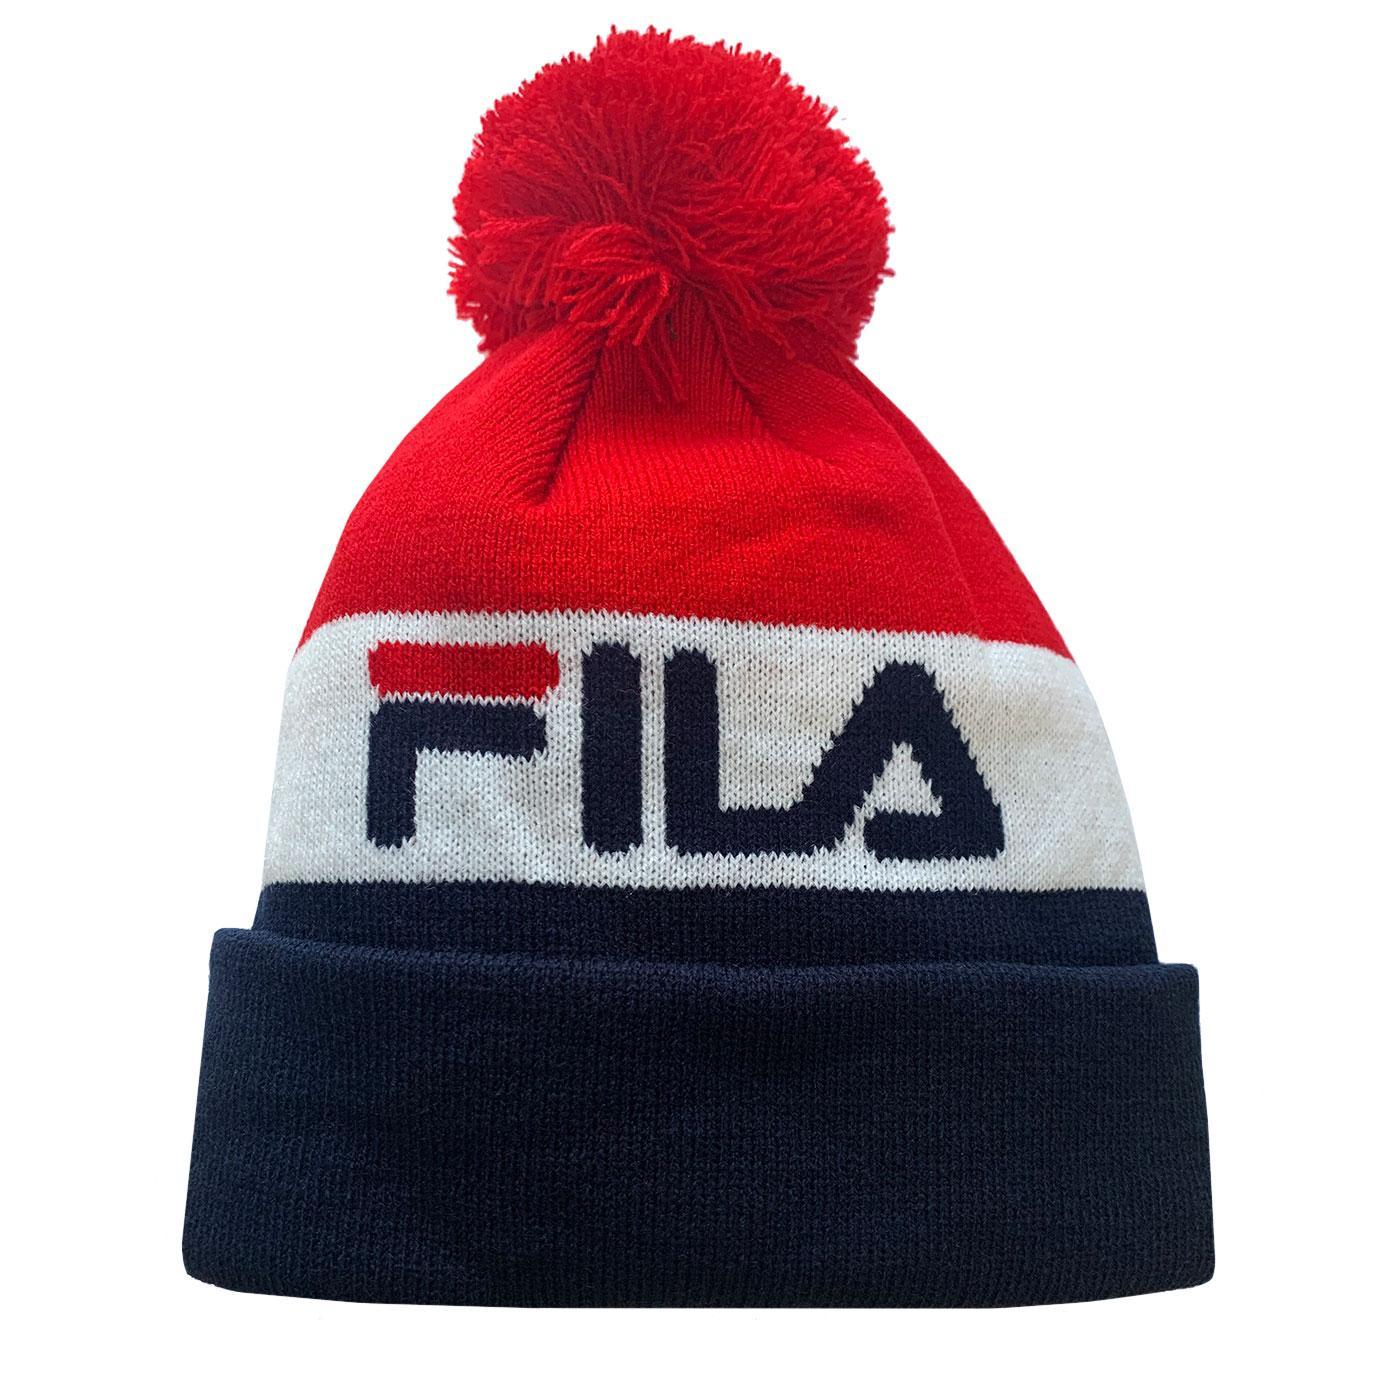 Kato FILA VINTAGE Retro Colour Block Bobble Hat